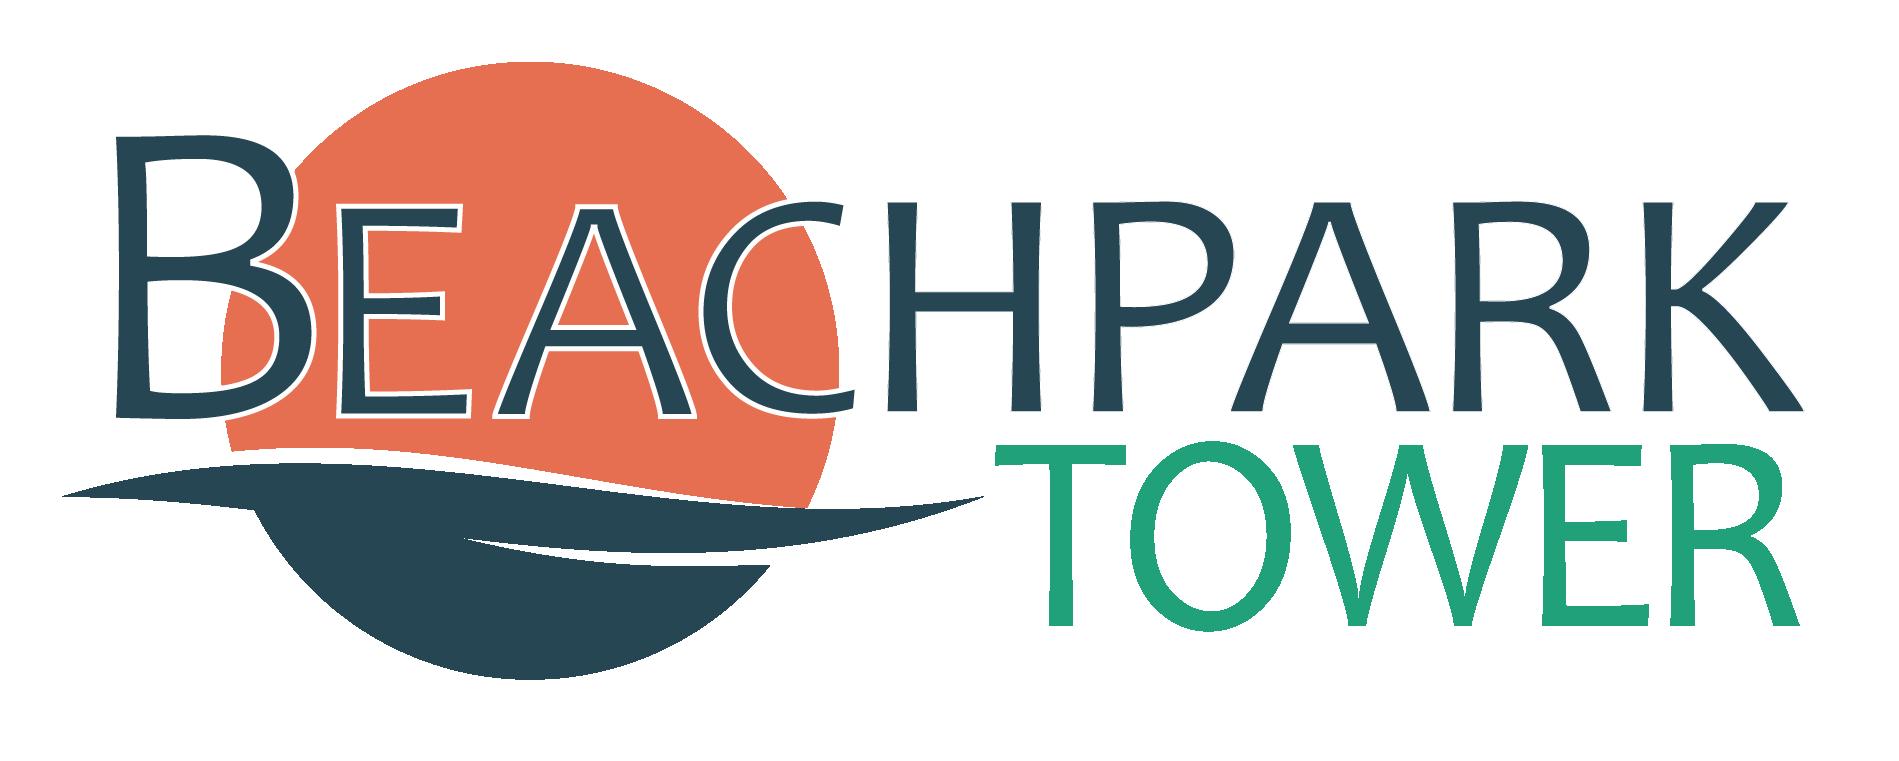 Beachpark tower logo